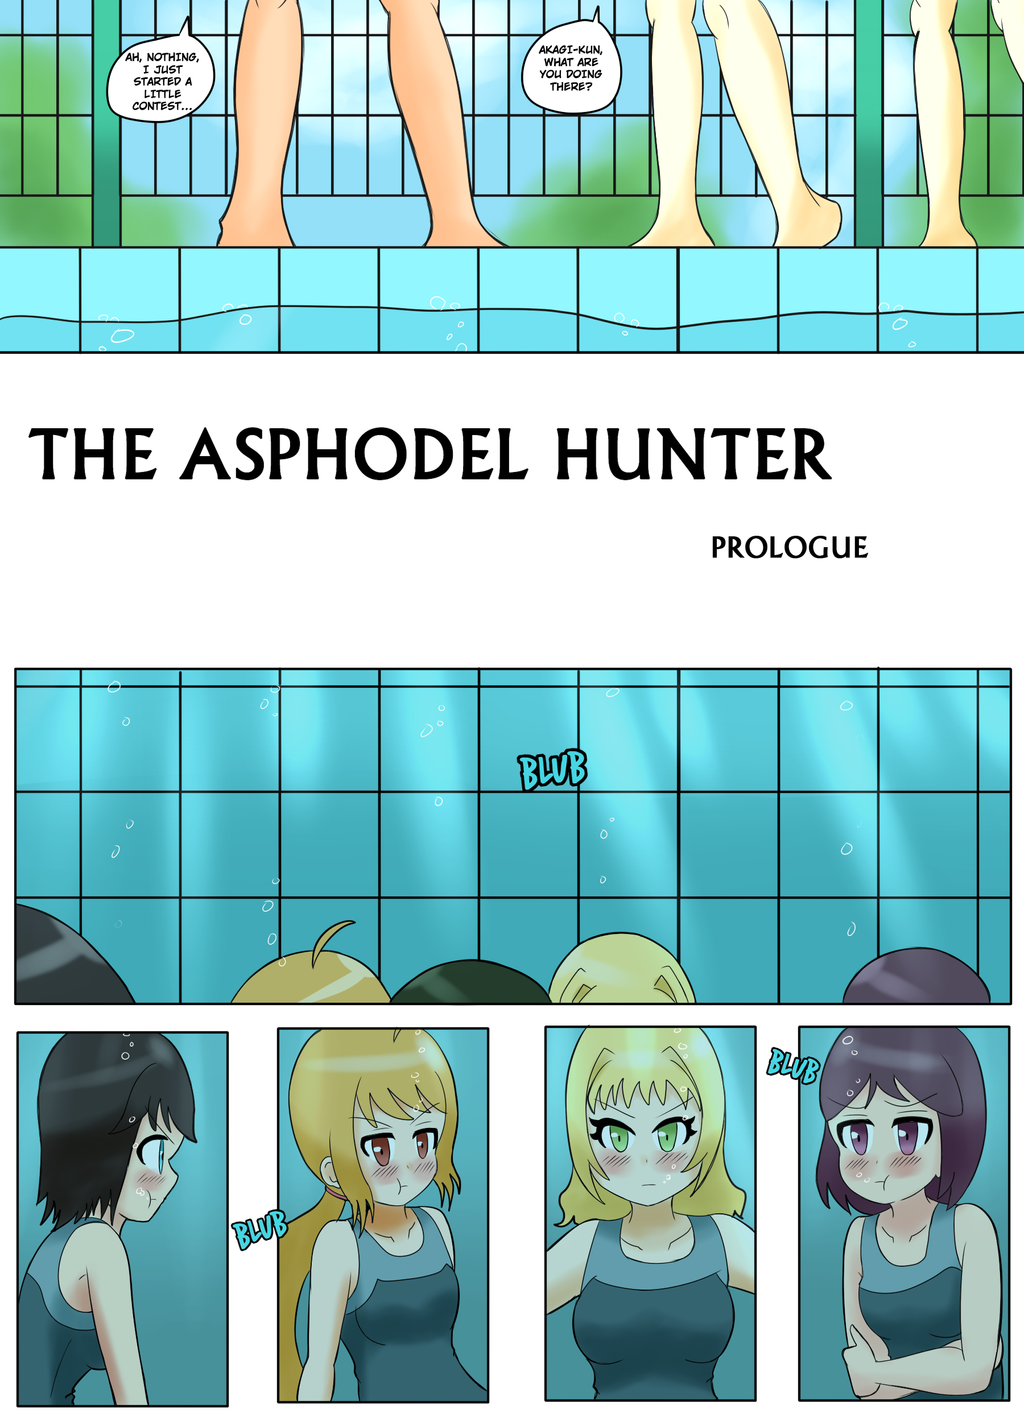 The Asphodel Hunter Prologue - Page 1 by JimLiesman